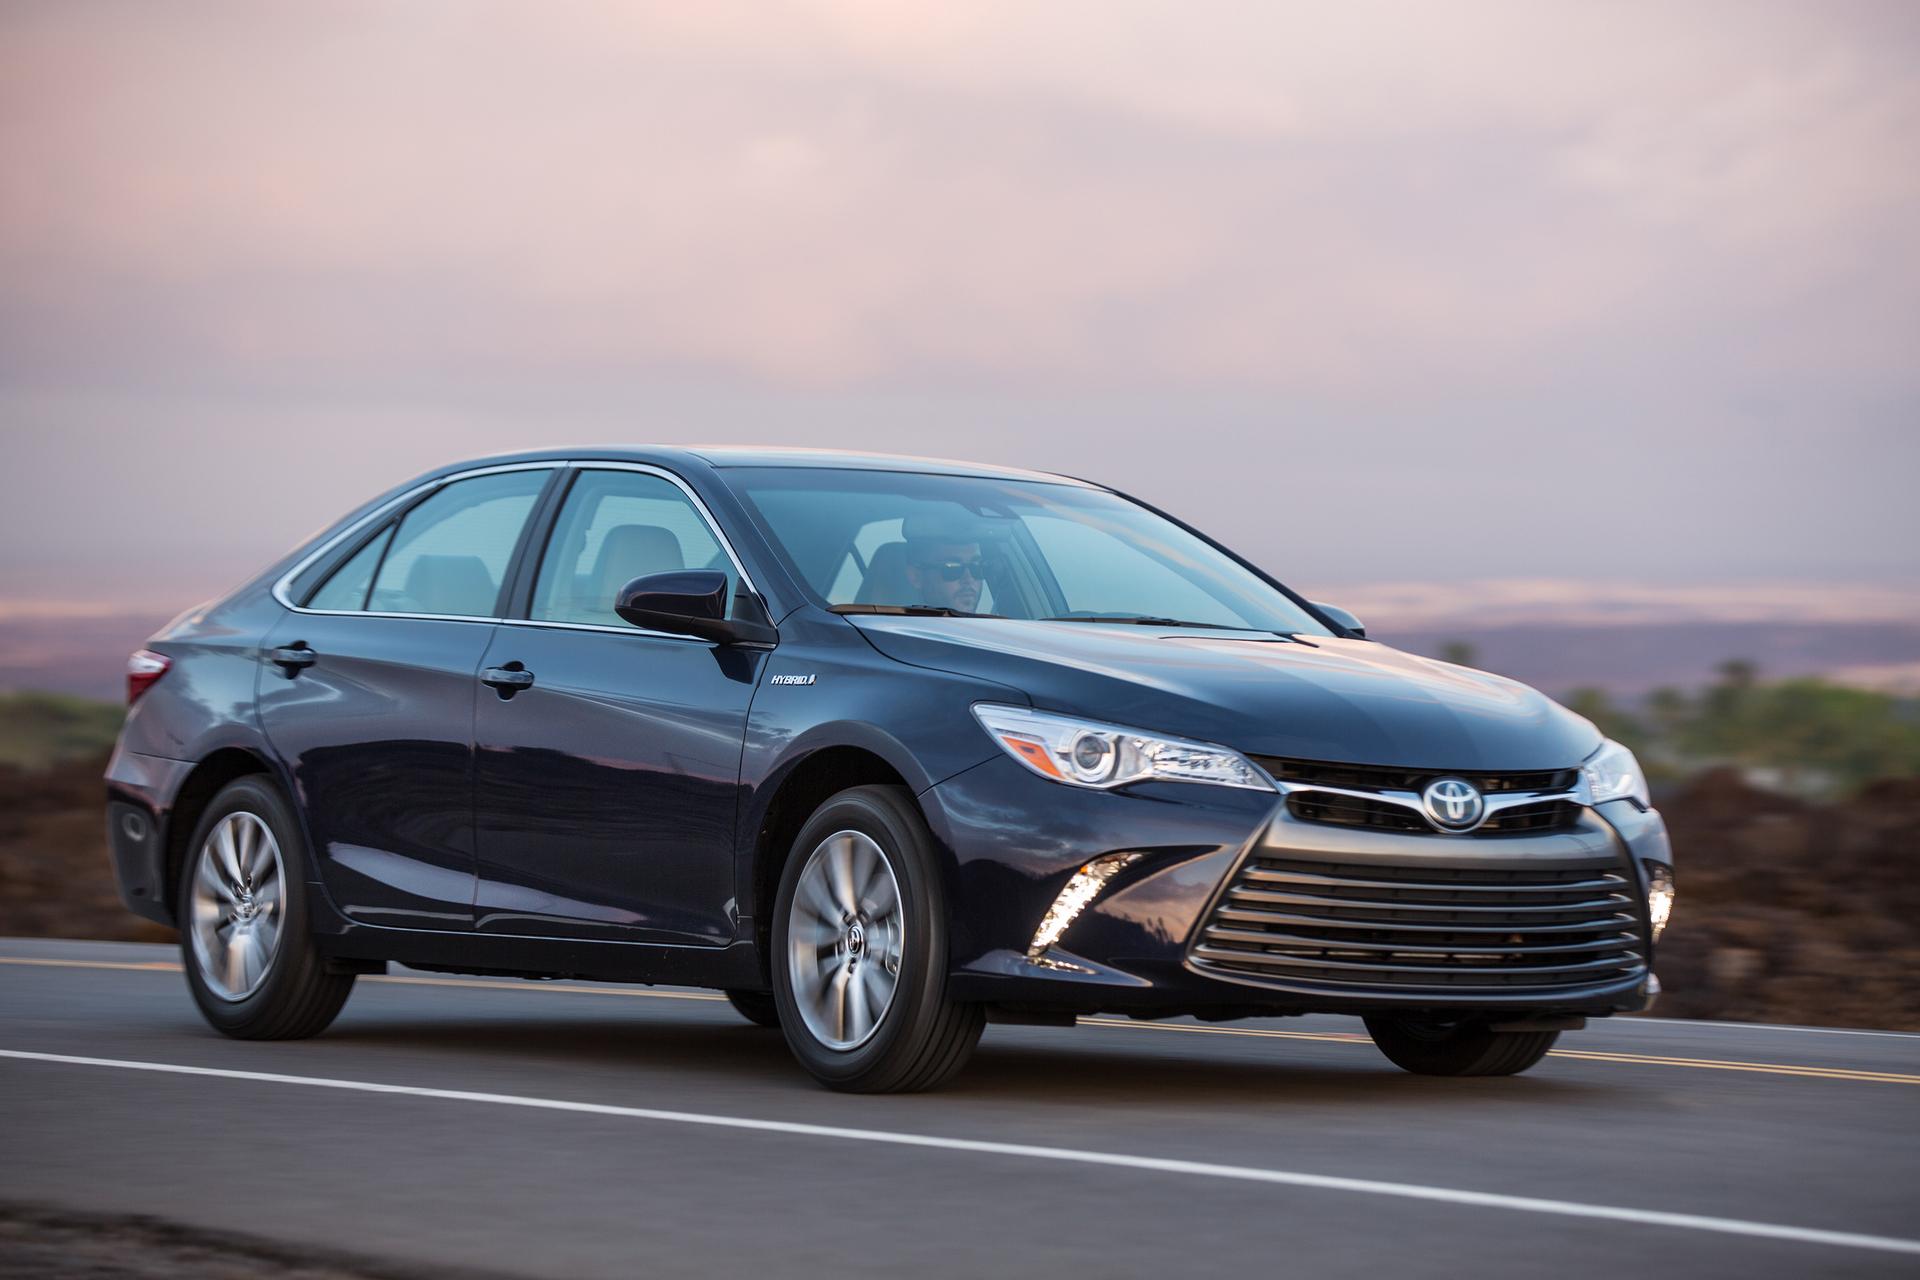 2017 Toyota Camry Hybrid Motor Corporation